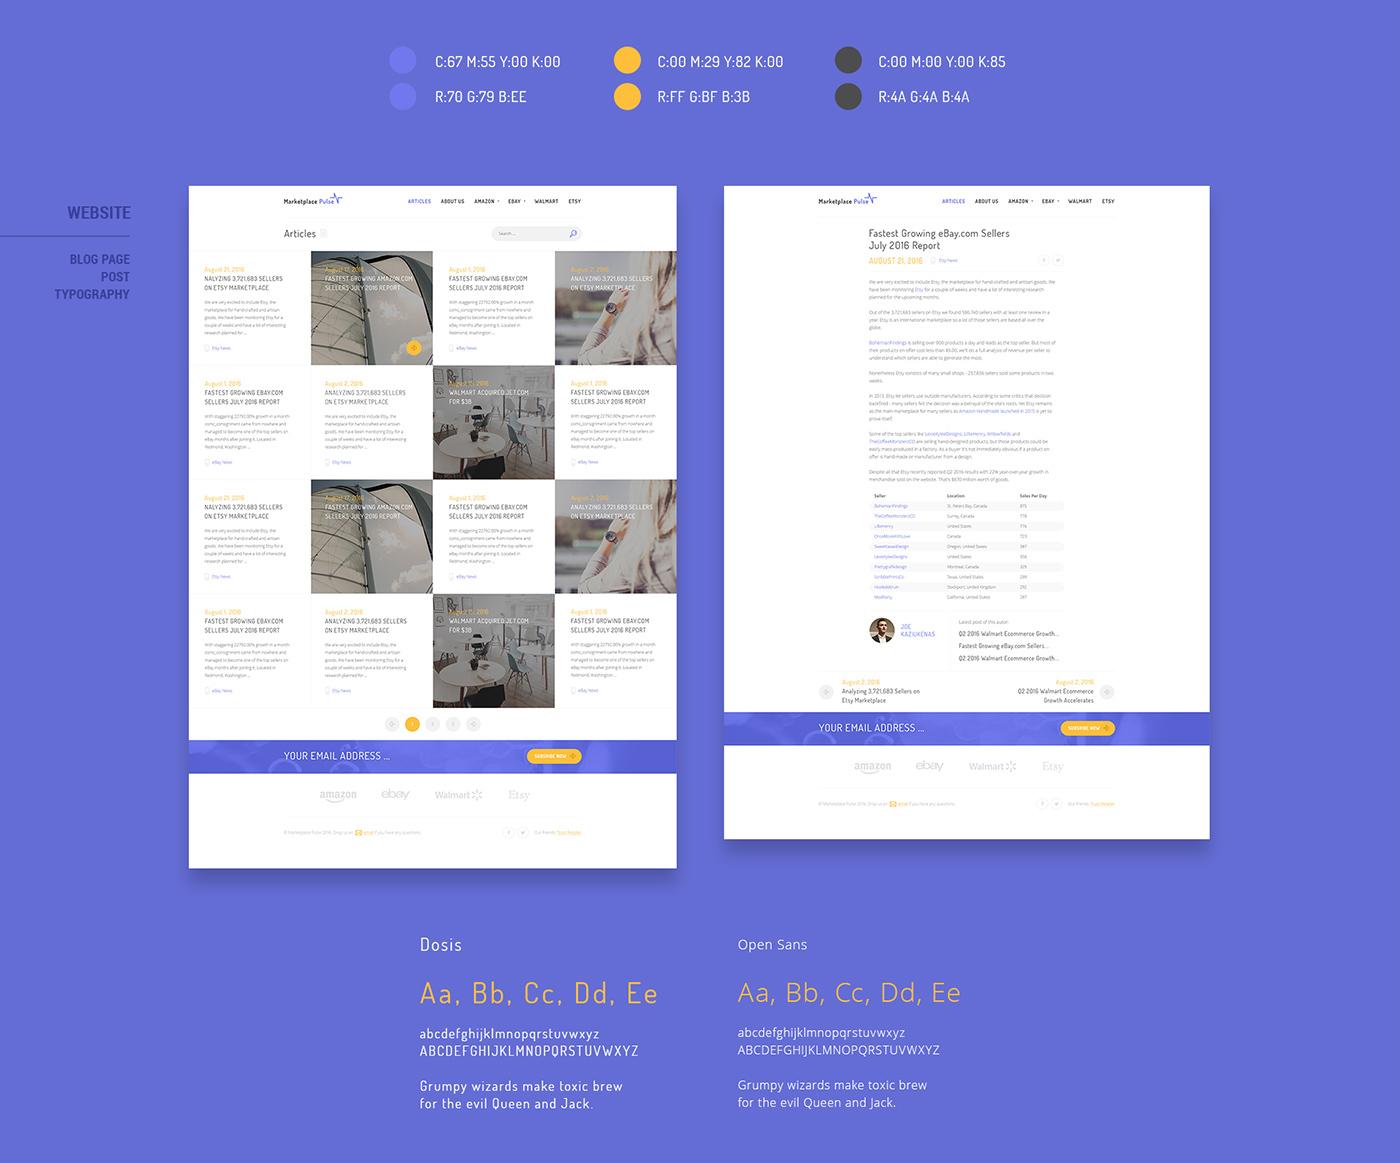 Web Webdesign design logo Ecommerce icons UI/UX interaction clean Marketplace